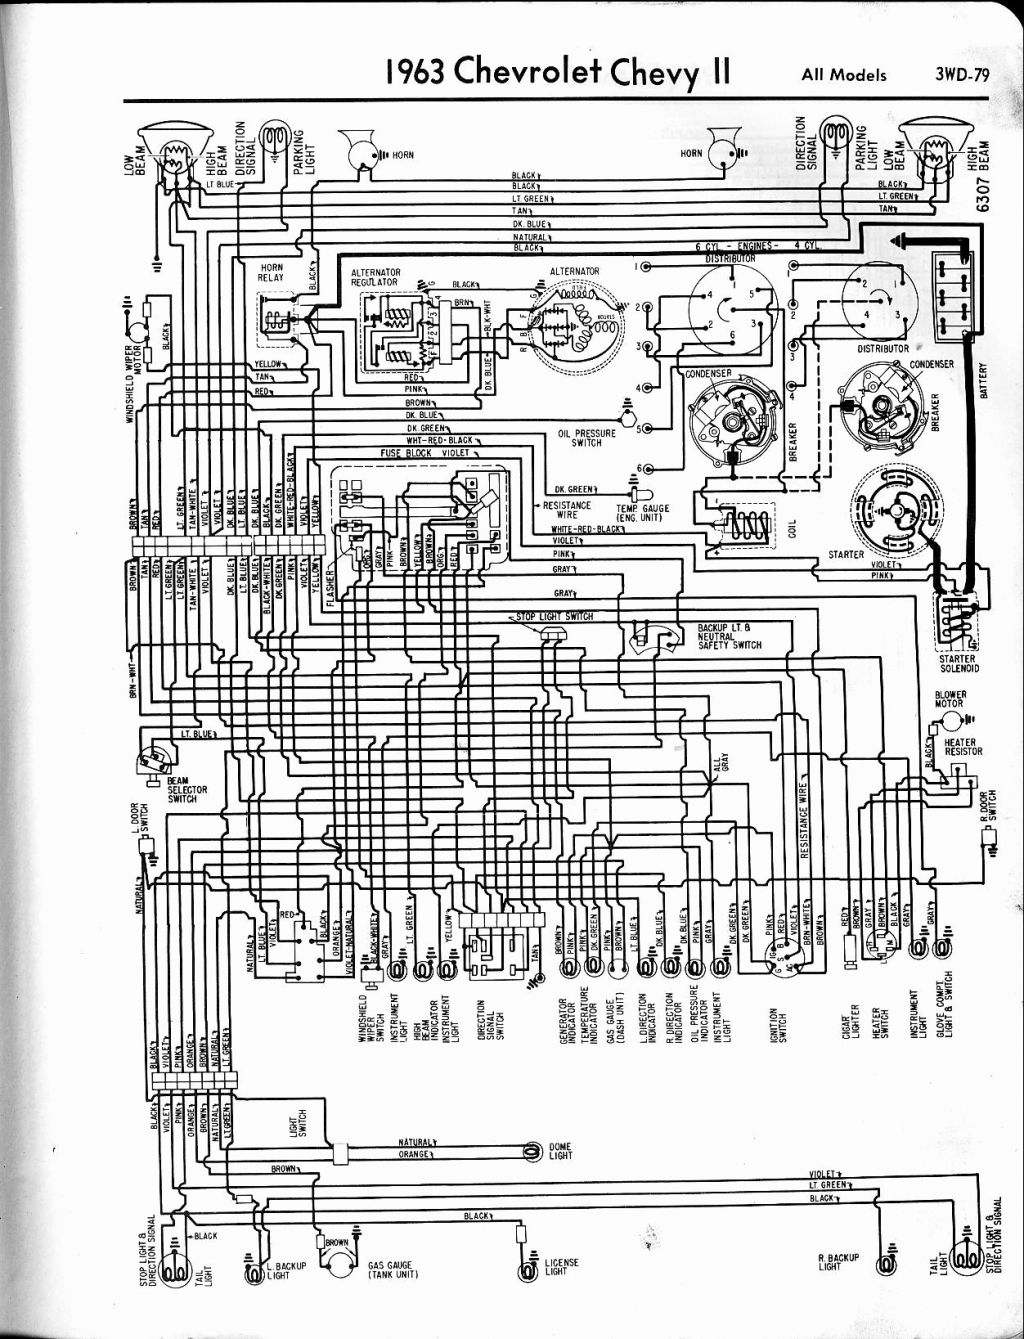 62 chevy truck wiring diagram 1968 chevy truck wiring diagram free download turn signal wiring diagram chevy truck | free wiring diagram